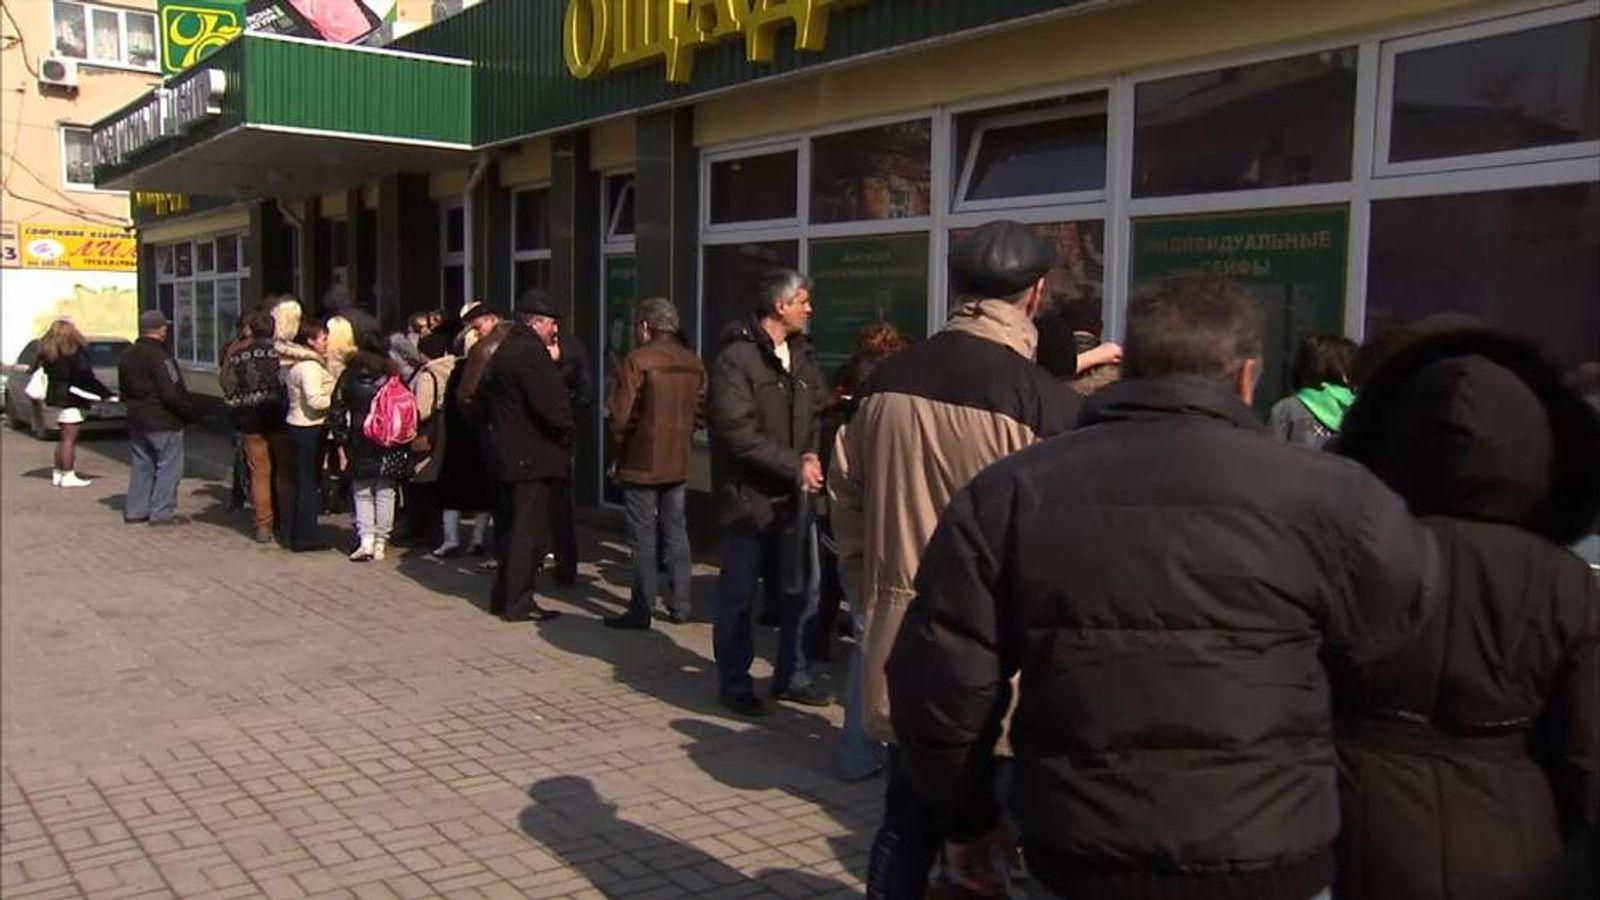 Queues outside a bank in Simferopol